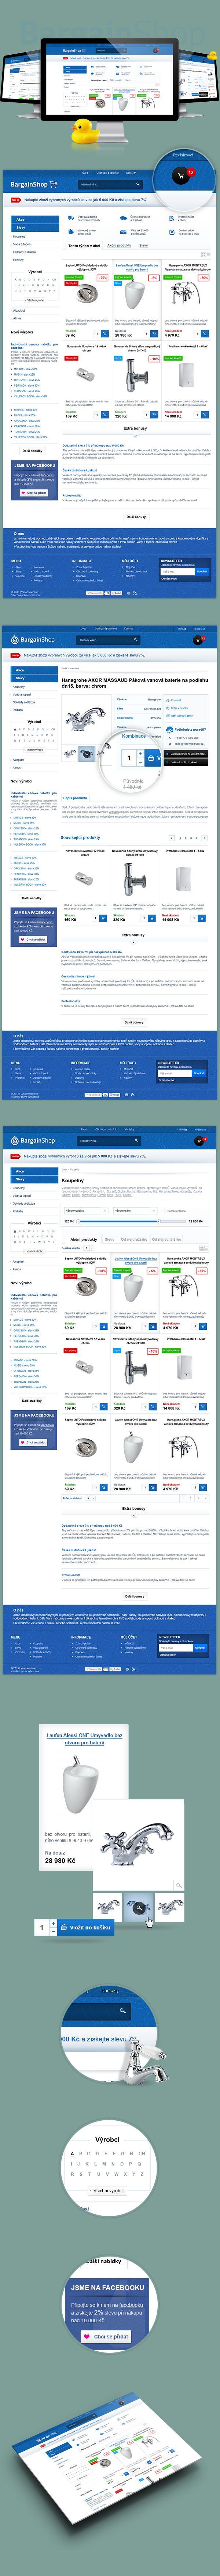 Bargainshop.cz by Visualcreative.cz , via Behance